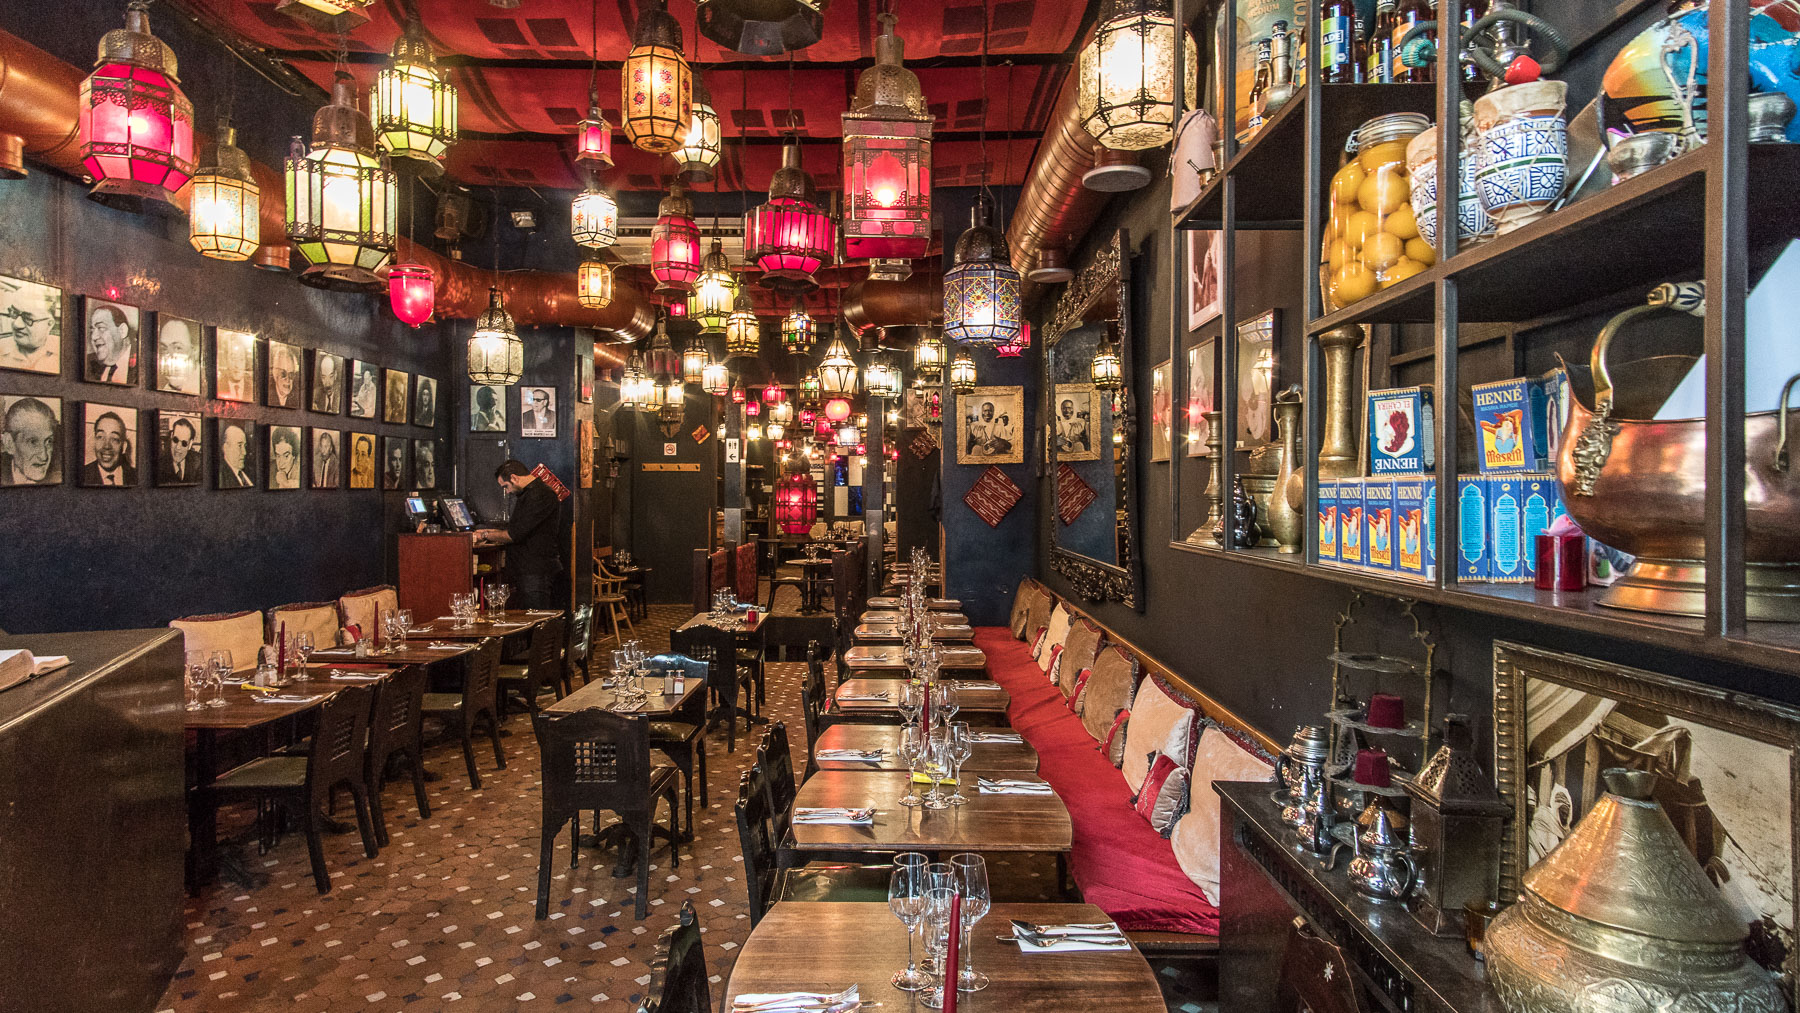 Moroccan Restaurant  / Brussels, Belgium